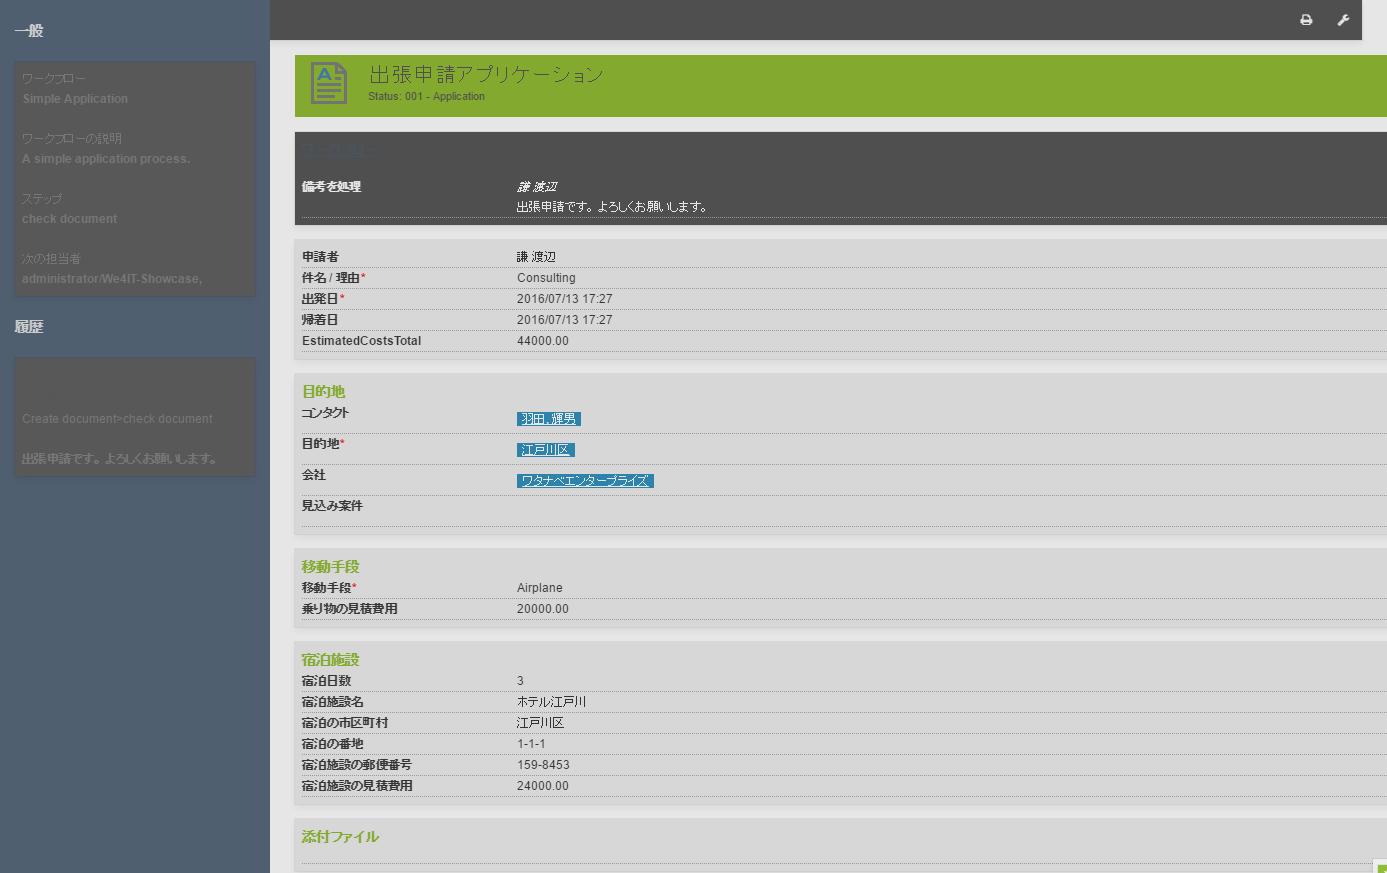 Aveedo-workflow01.png